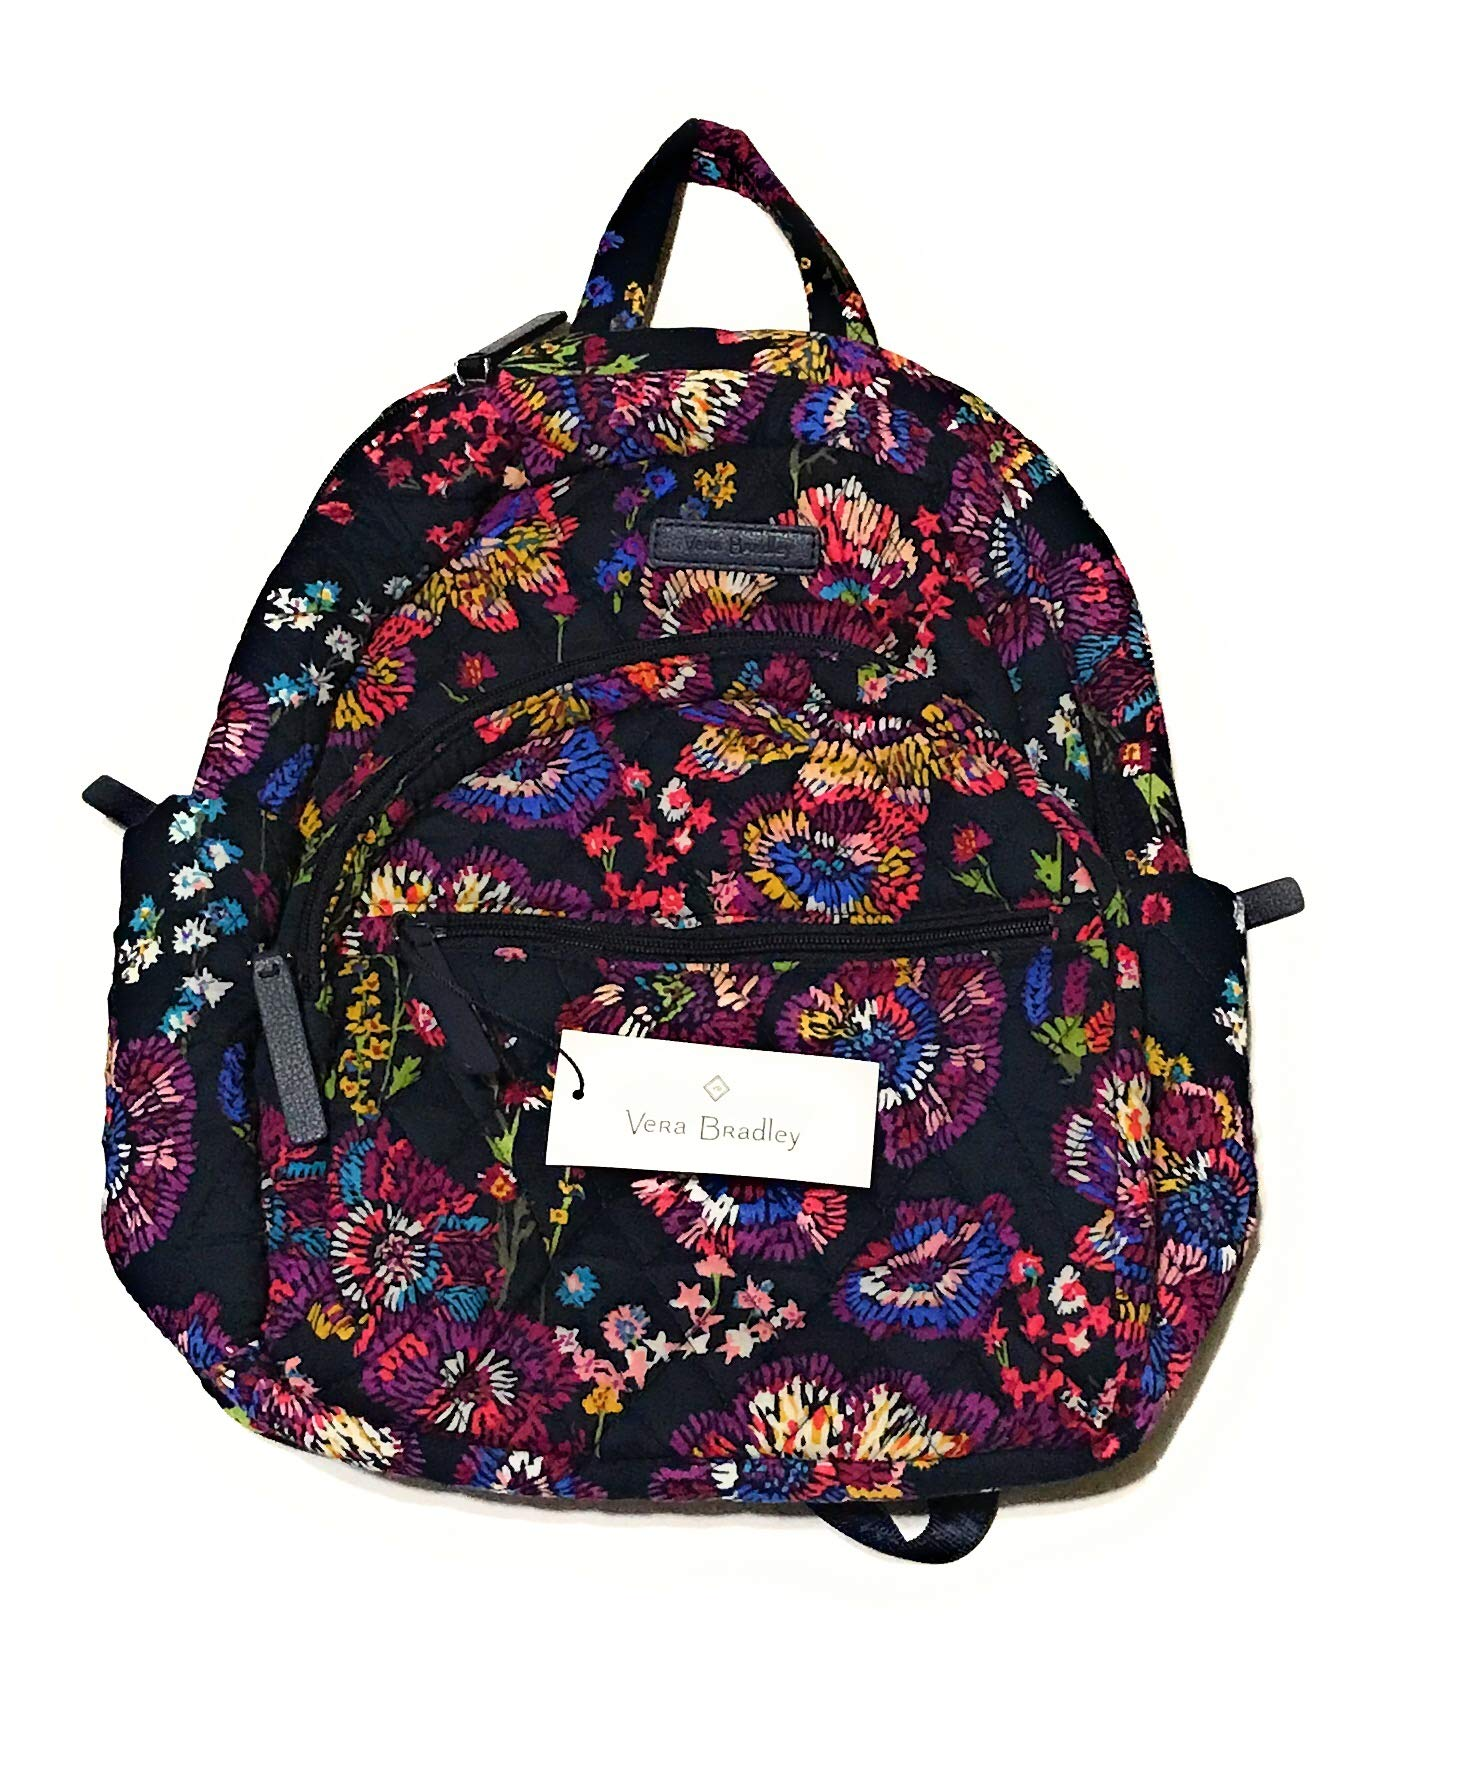 Vera Bradley Essential Compact Backpack - Midnight Wildflowers by Vera Bradley